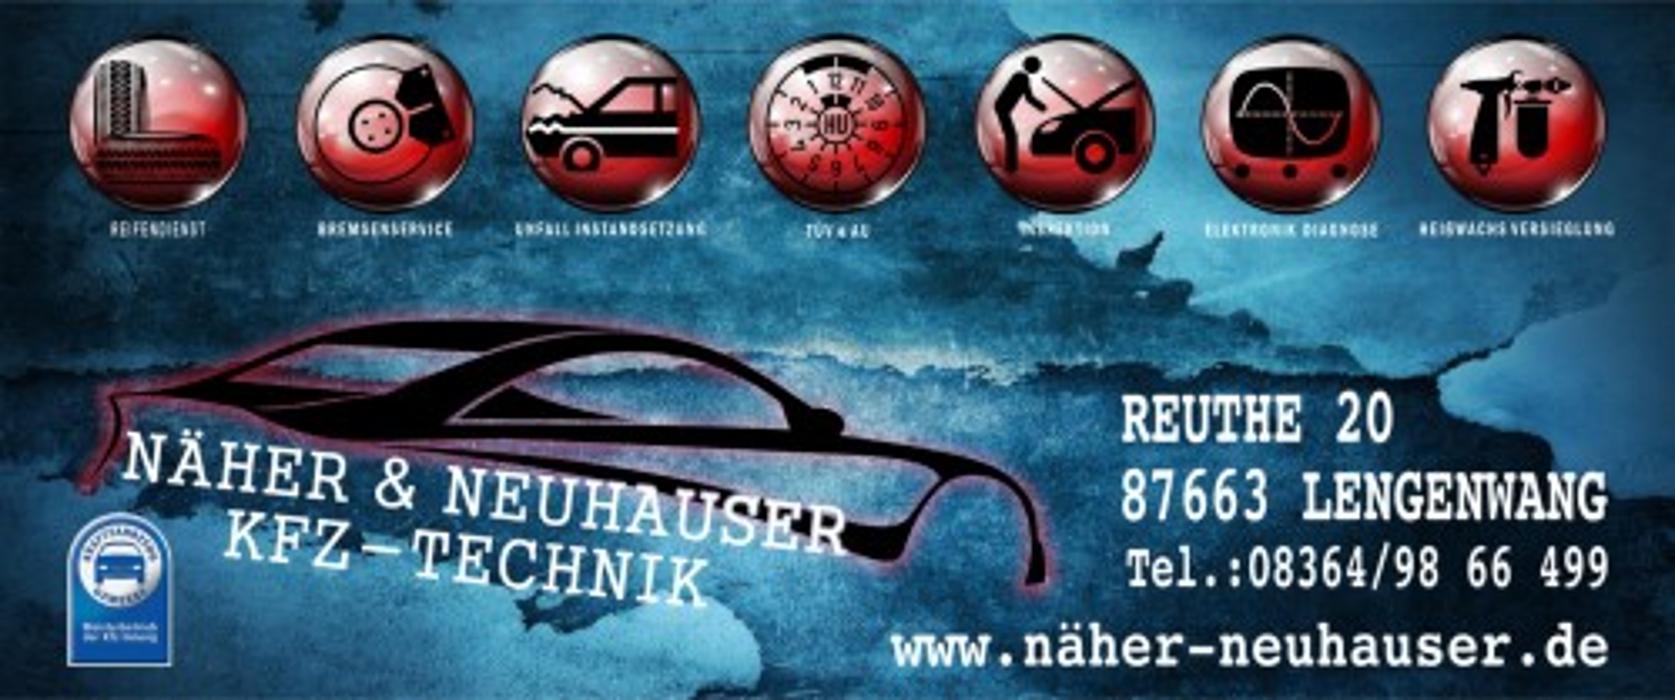 Bild zu KFZ-Technik Näher & Neuhauser GbR in Lengenwang